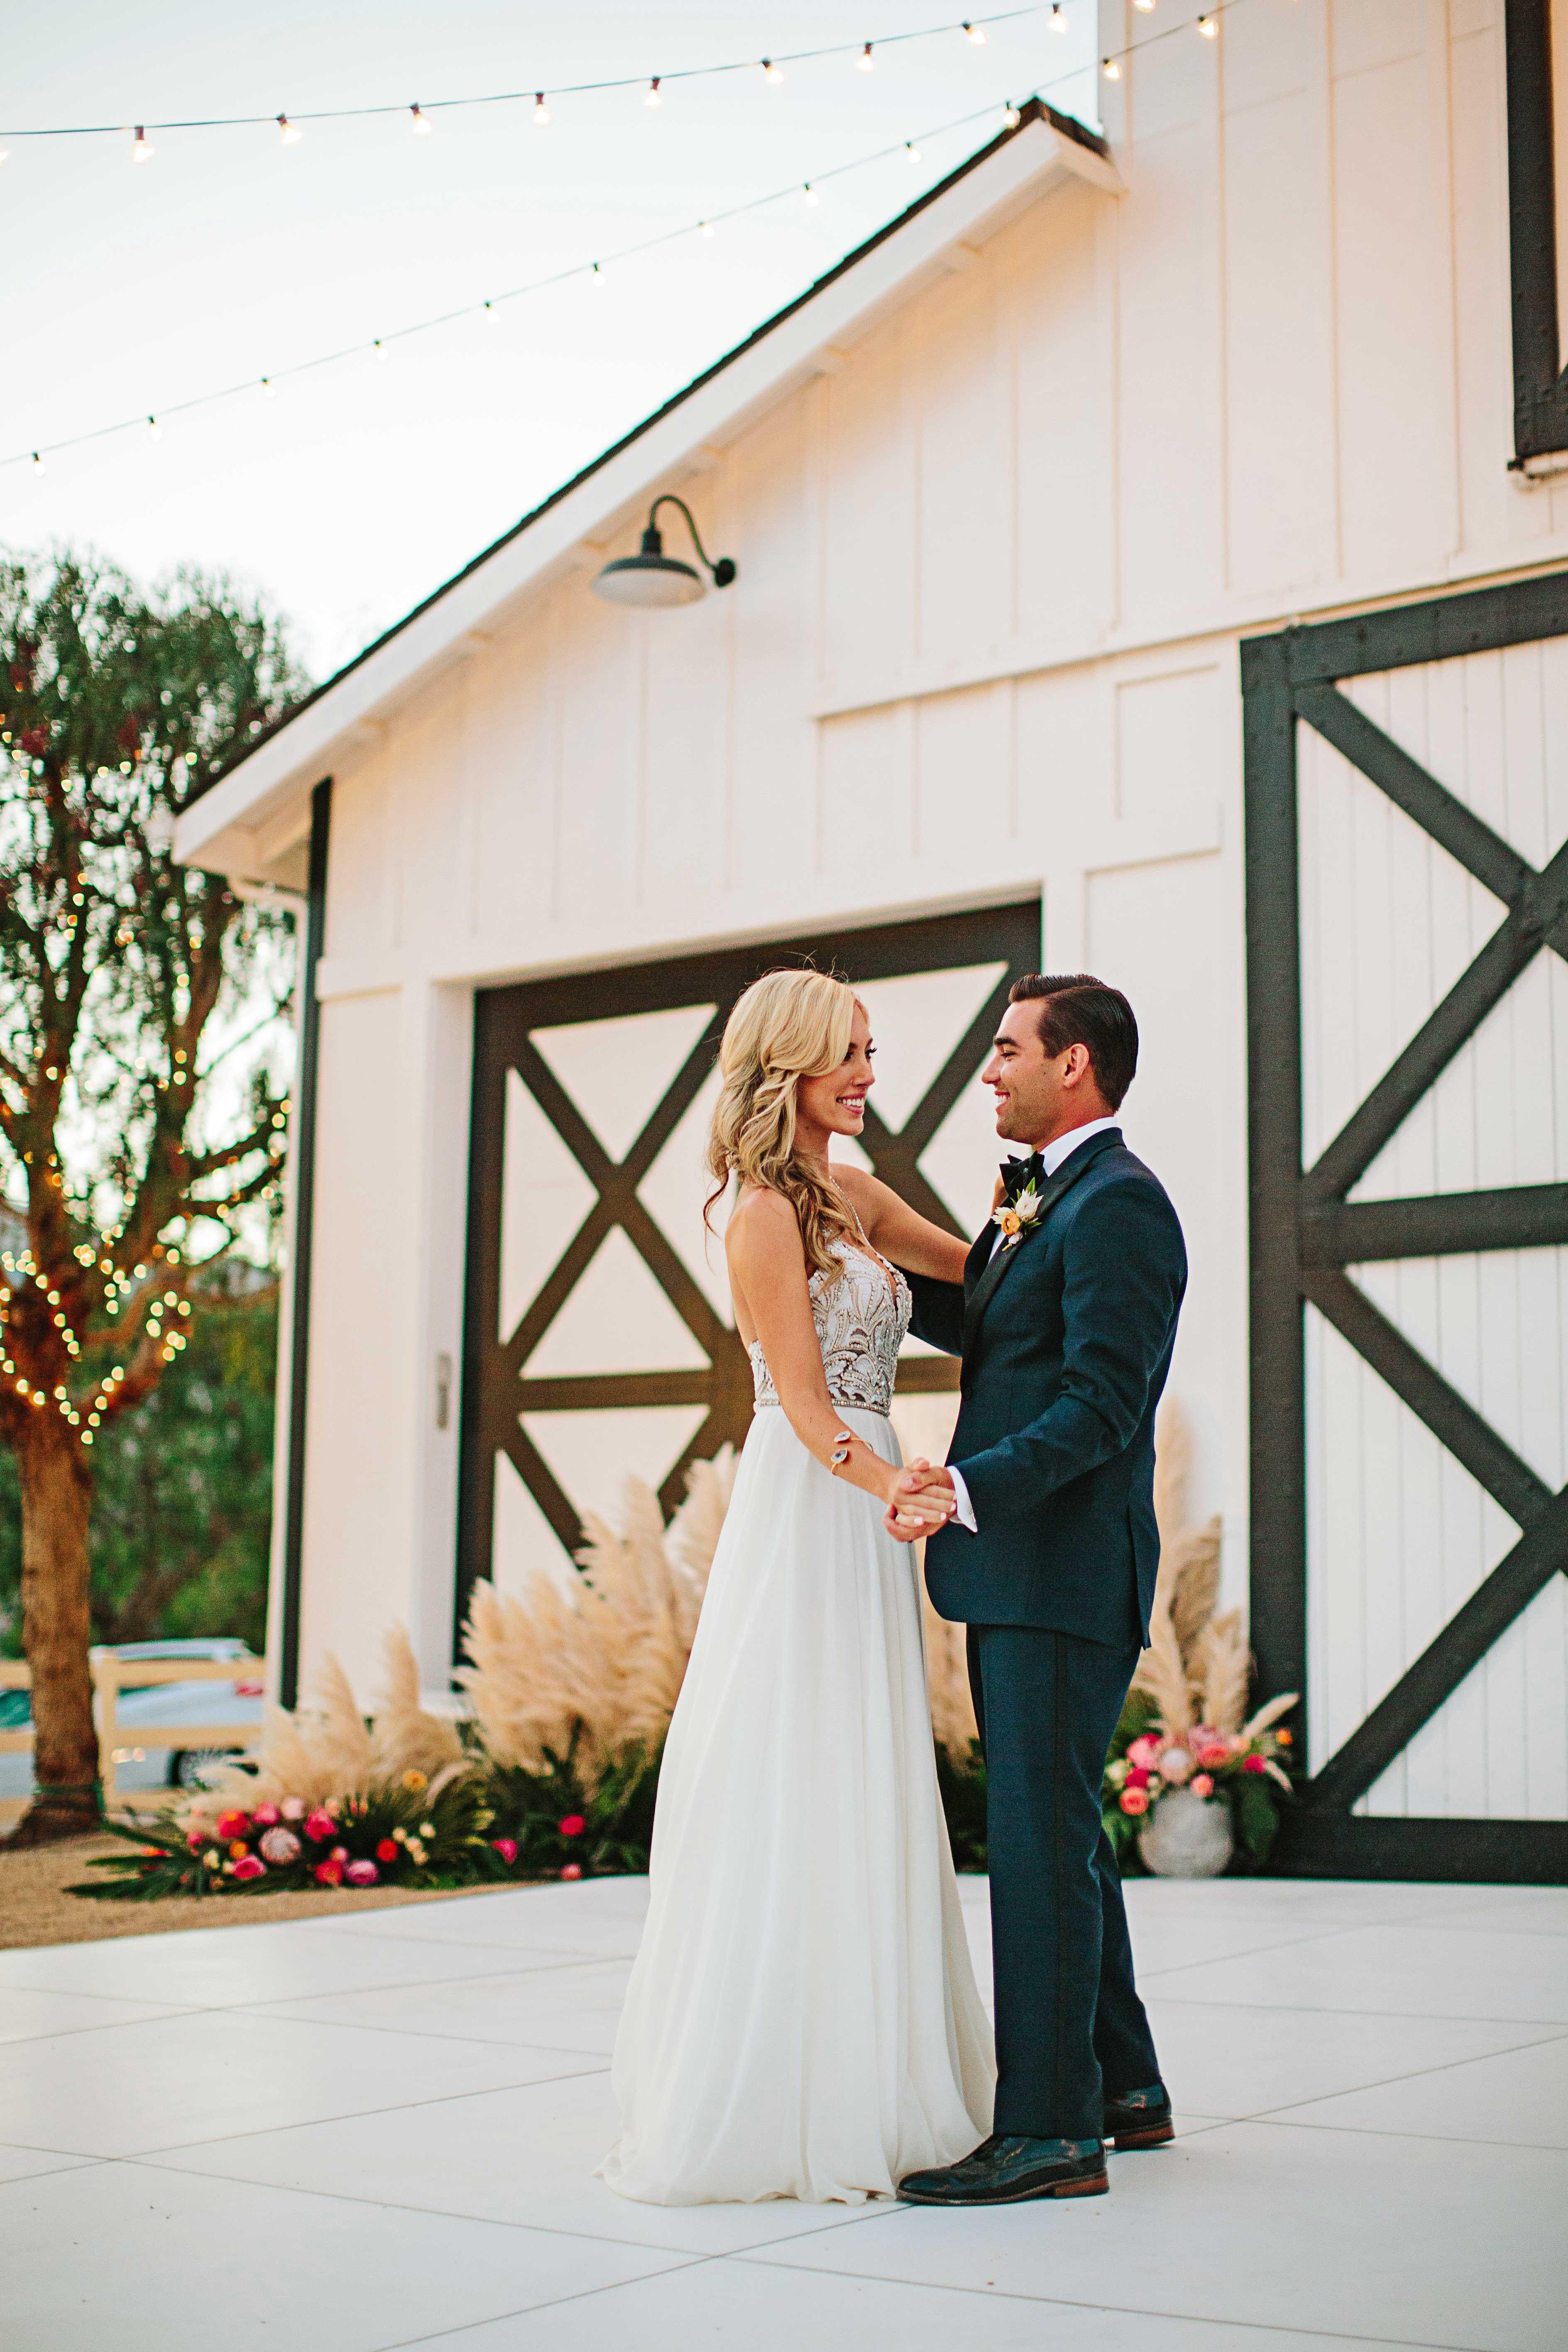 stephanie jared wedding first dance